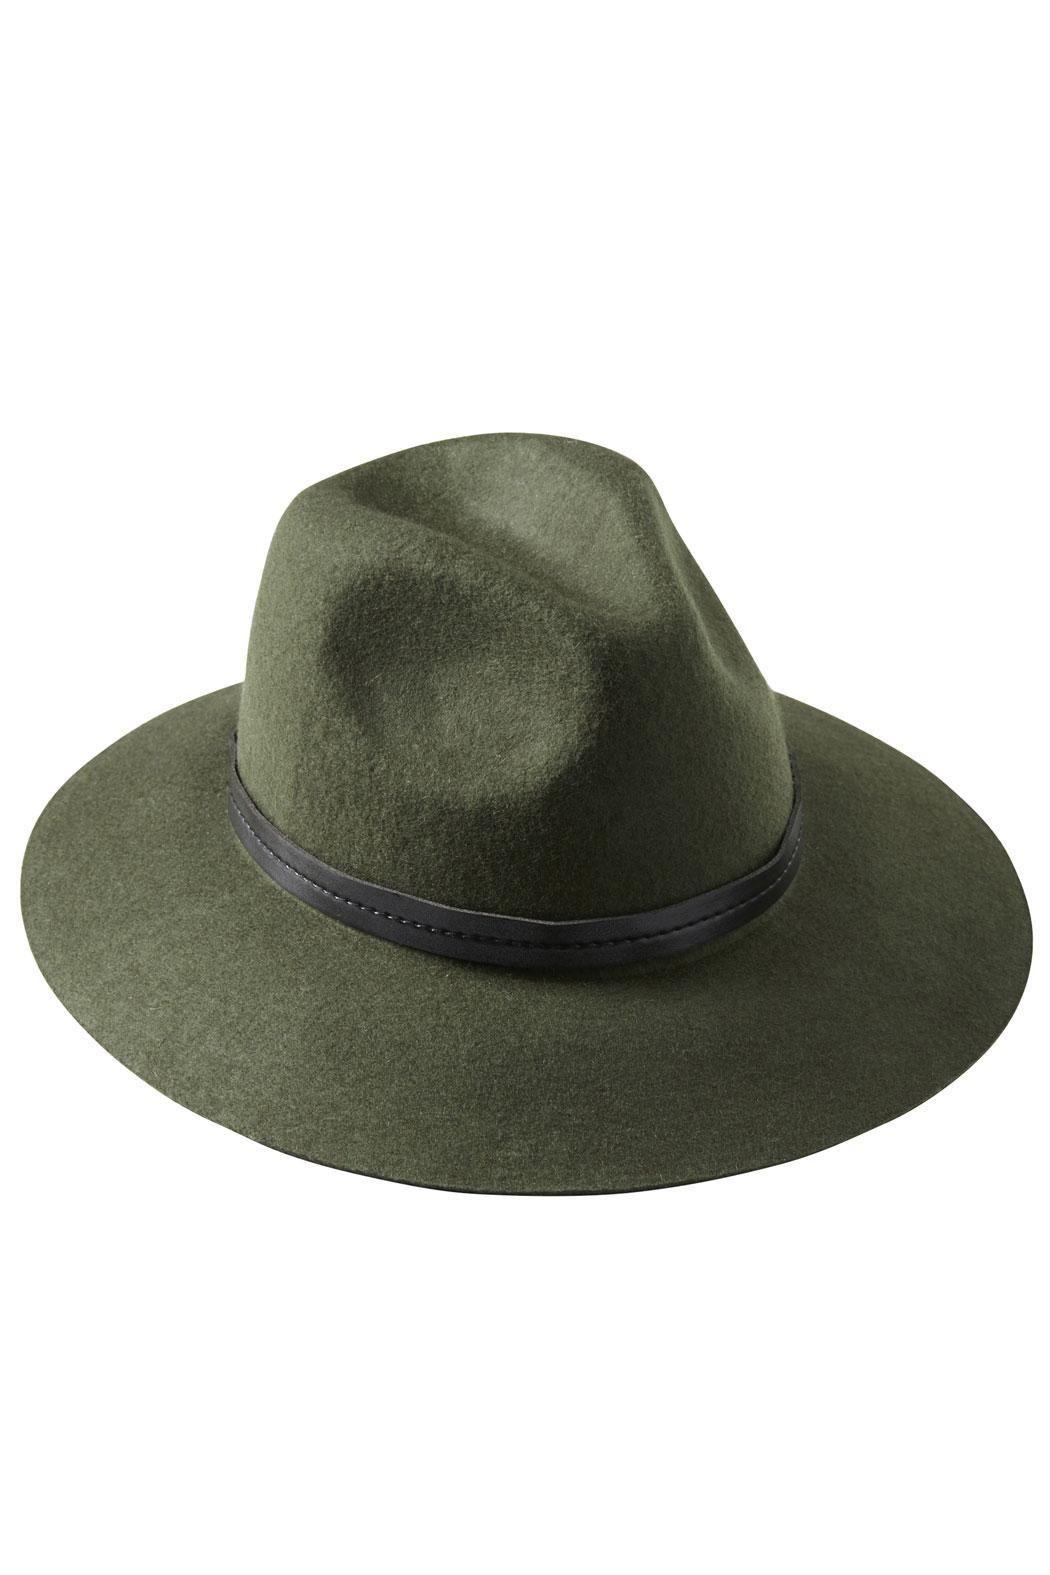 Accesorios - Sombreros Mínimo 3toH9izb3